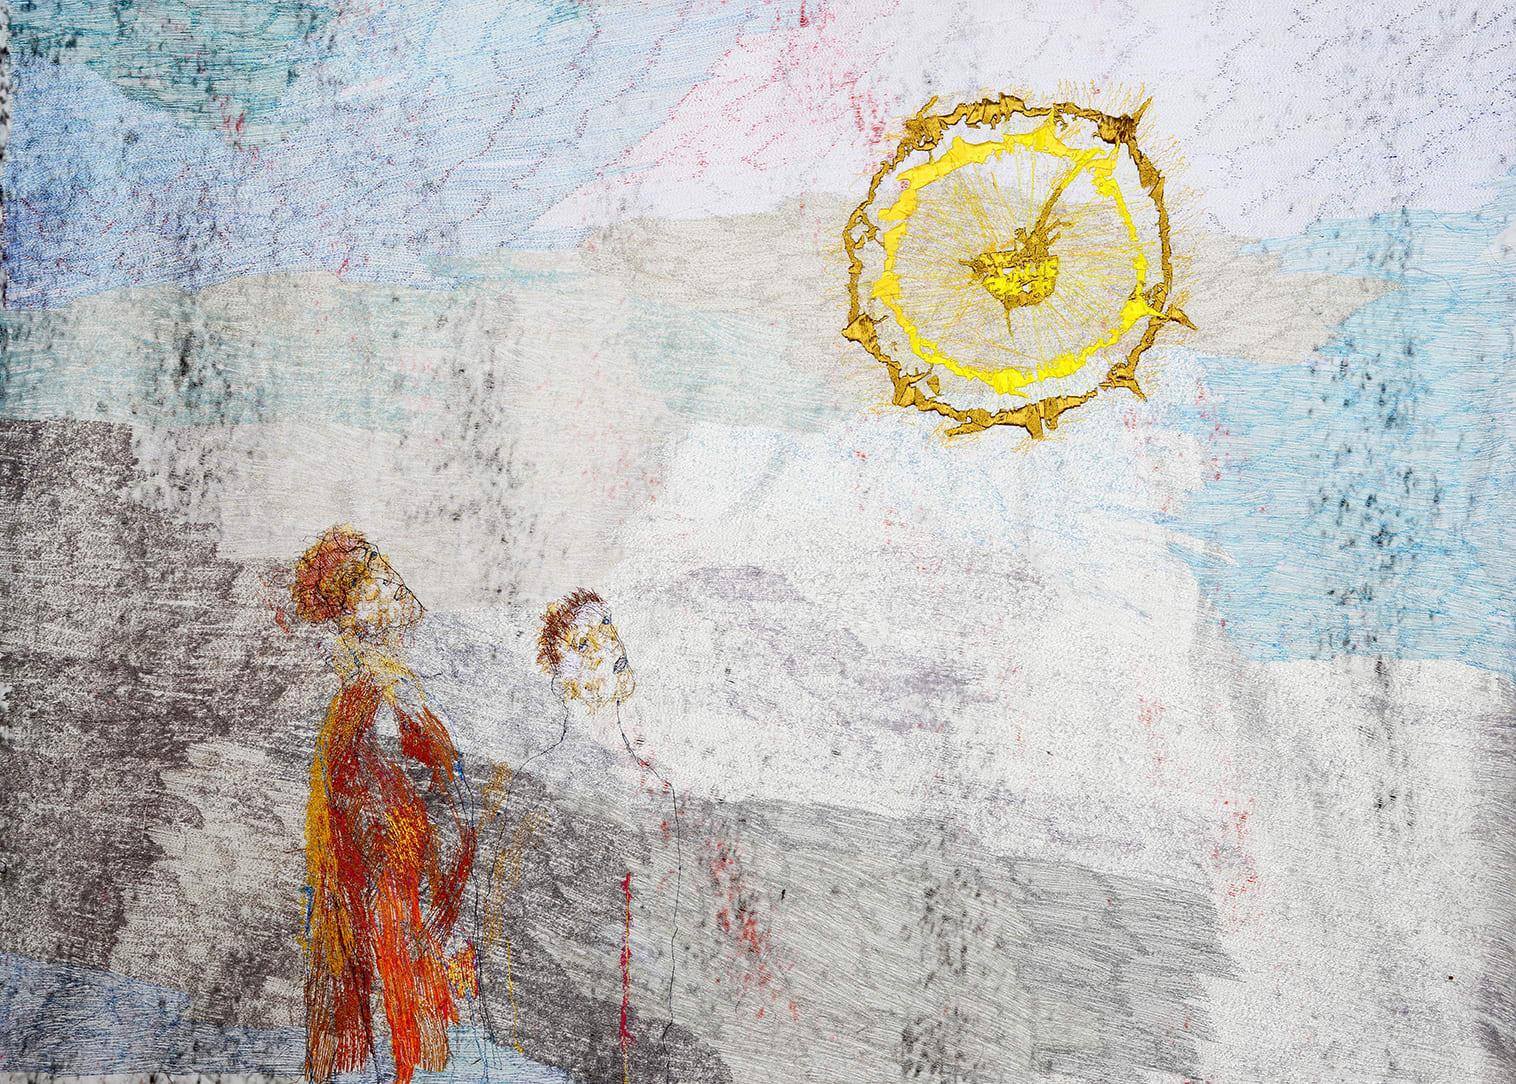 Alice Kettle, Sunbathers, 2017